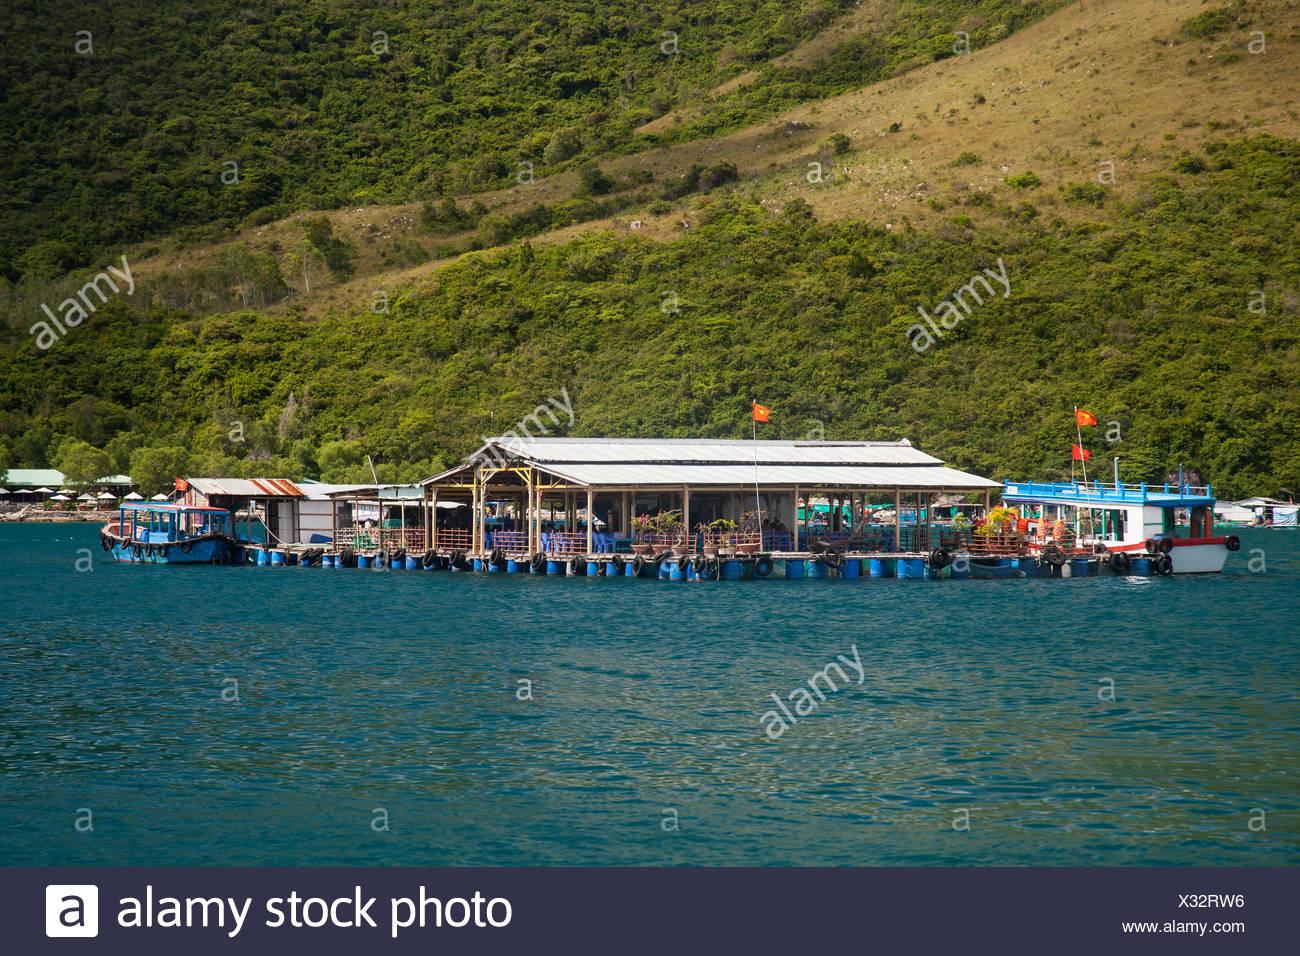 Bay, Vinpearl, island, South China Sea, sea, Asian, Asia, outside, mountains, mountainous, landscape, island, scenery, Nha, Trang - Stock Image